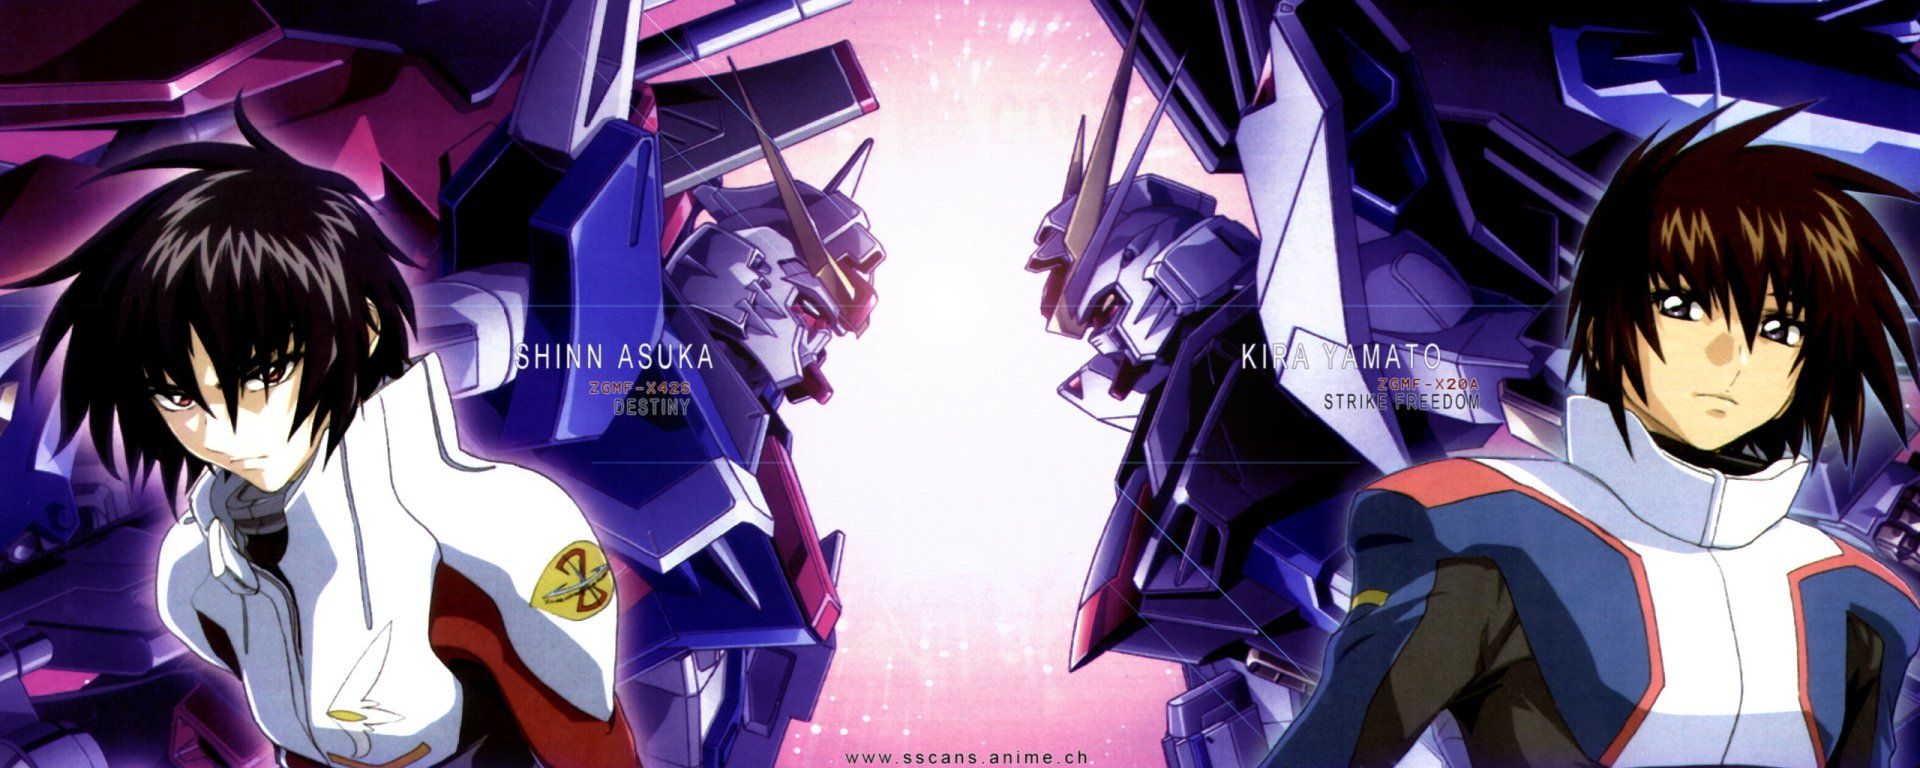 Anime Mobile Suit Gundam Seed Destiny Wallpaper ガンダムシリーズ